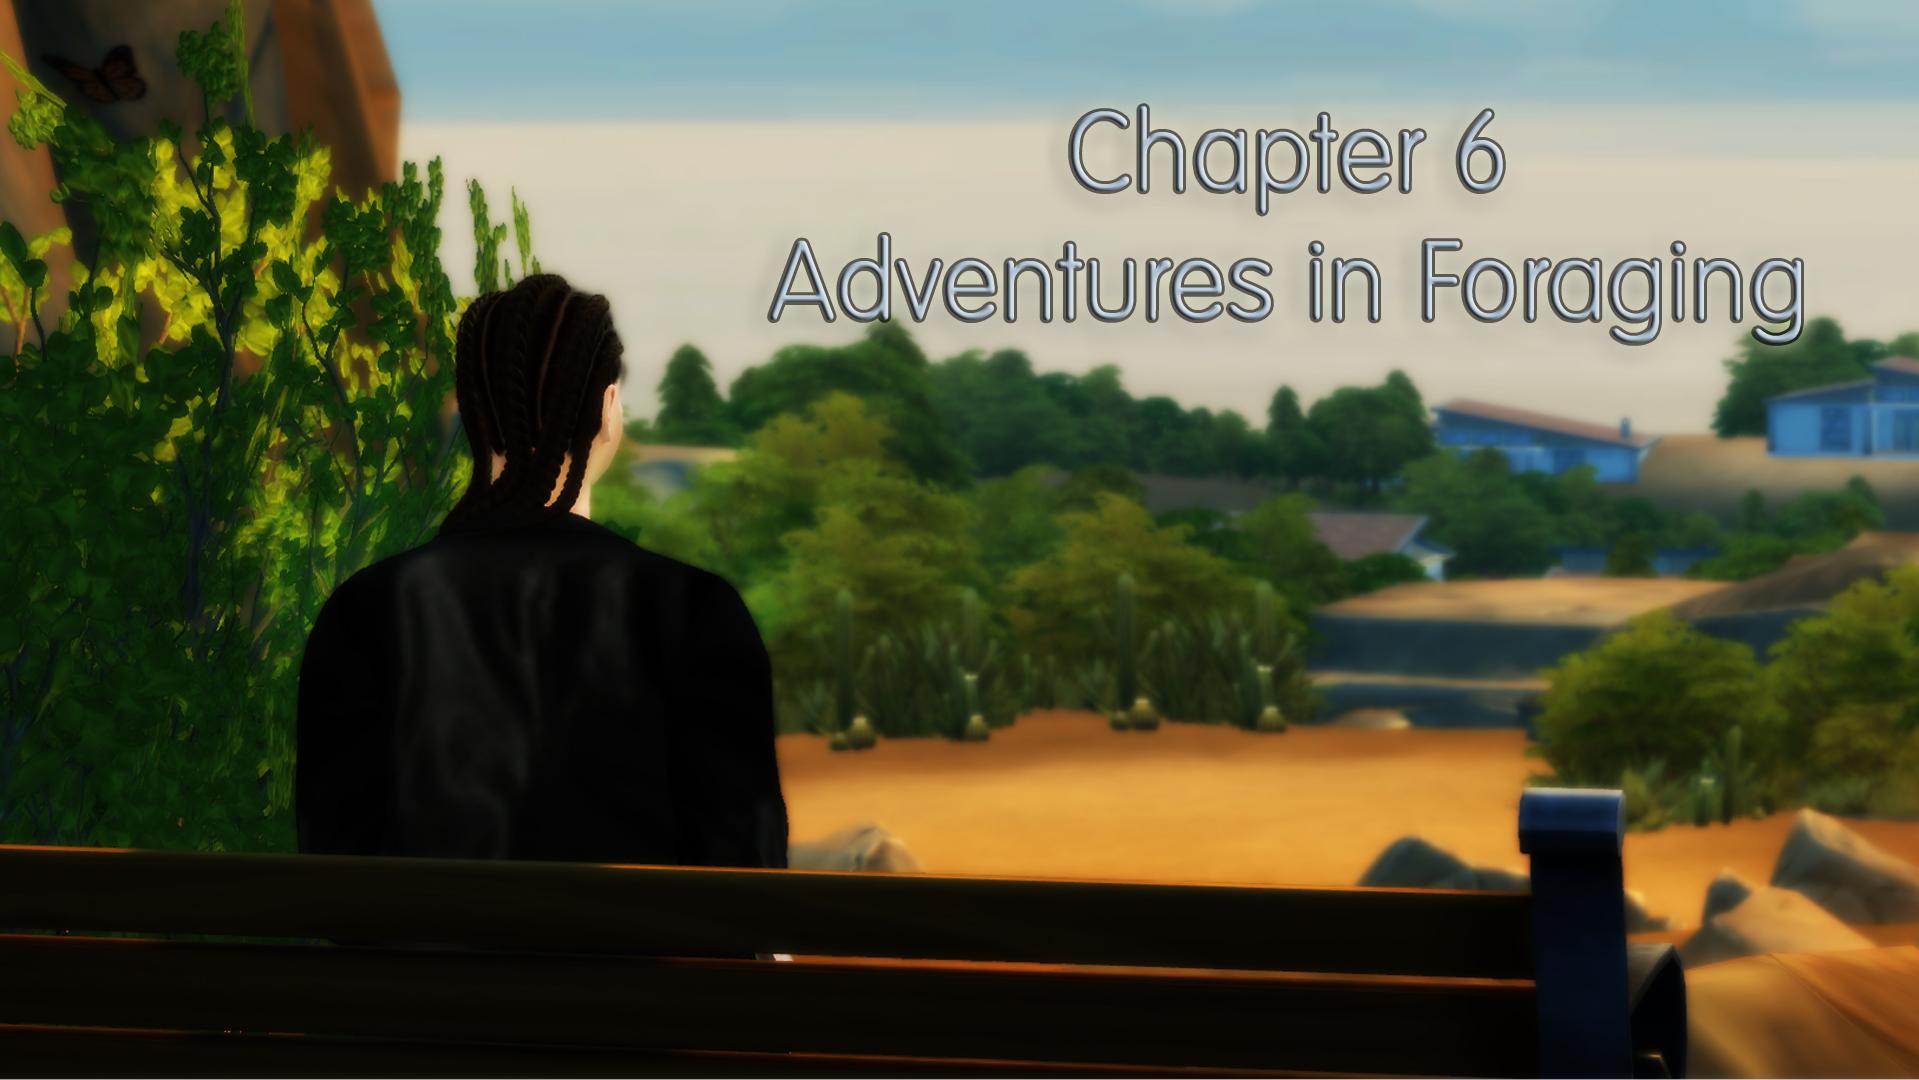 1 adventures in foraging